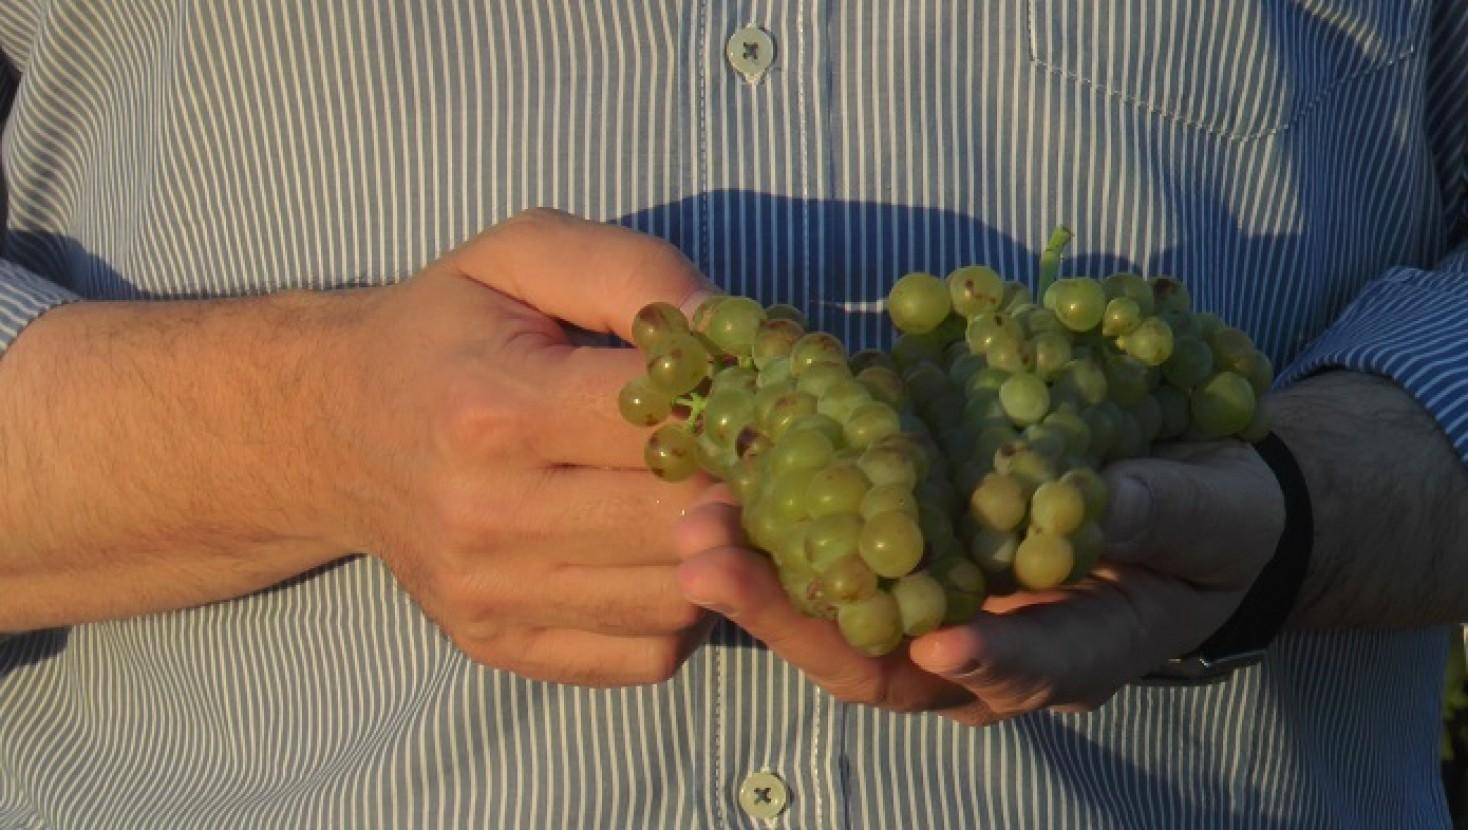 Los Vinos de La Mancha Prometen